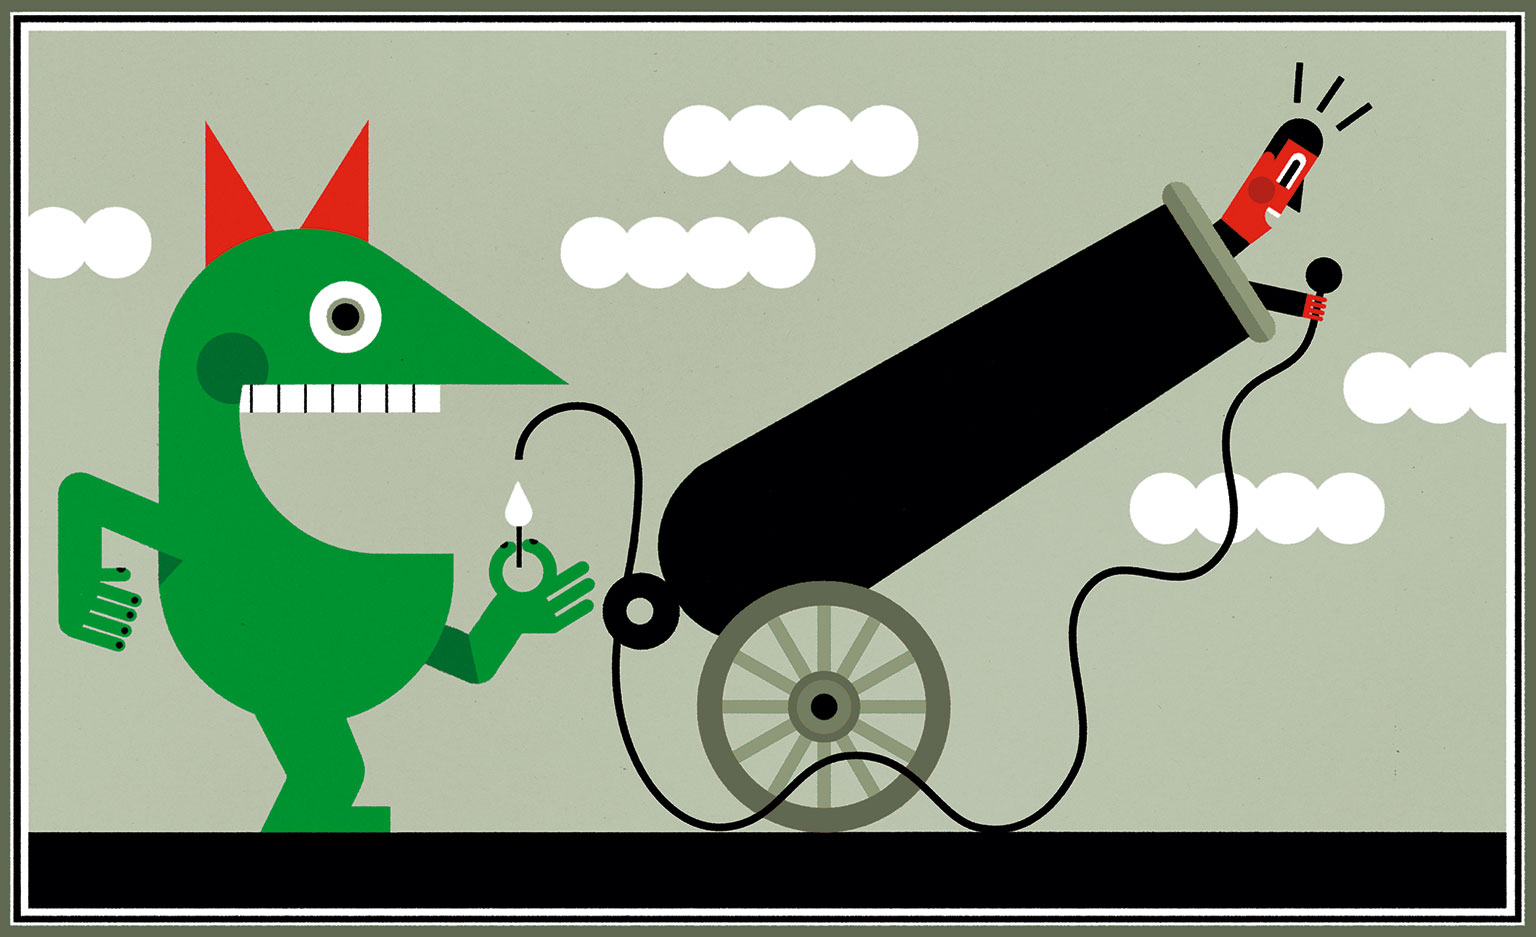 Illustration by Luc Melanson